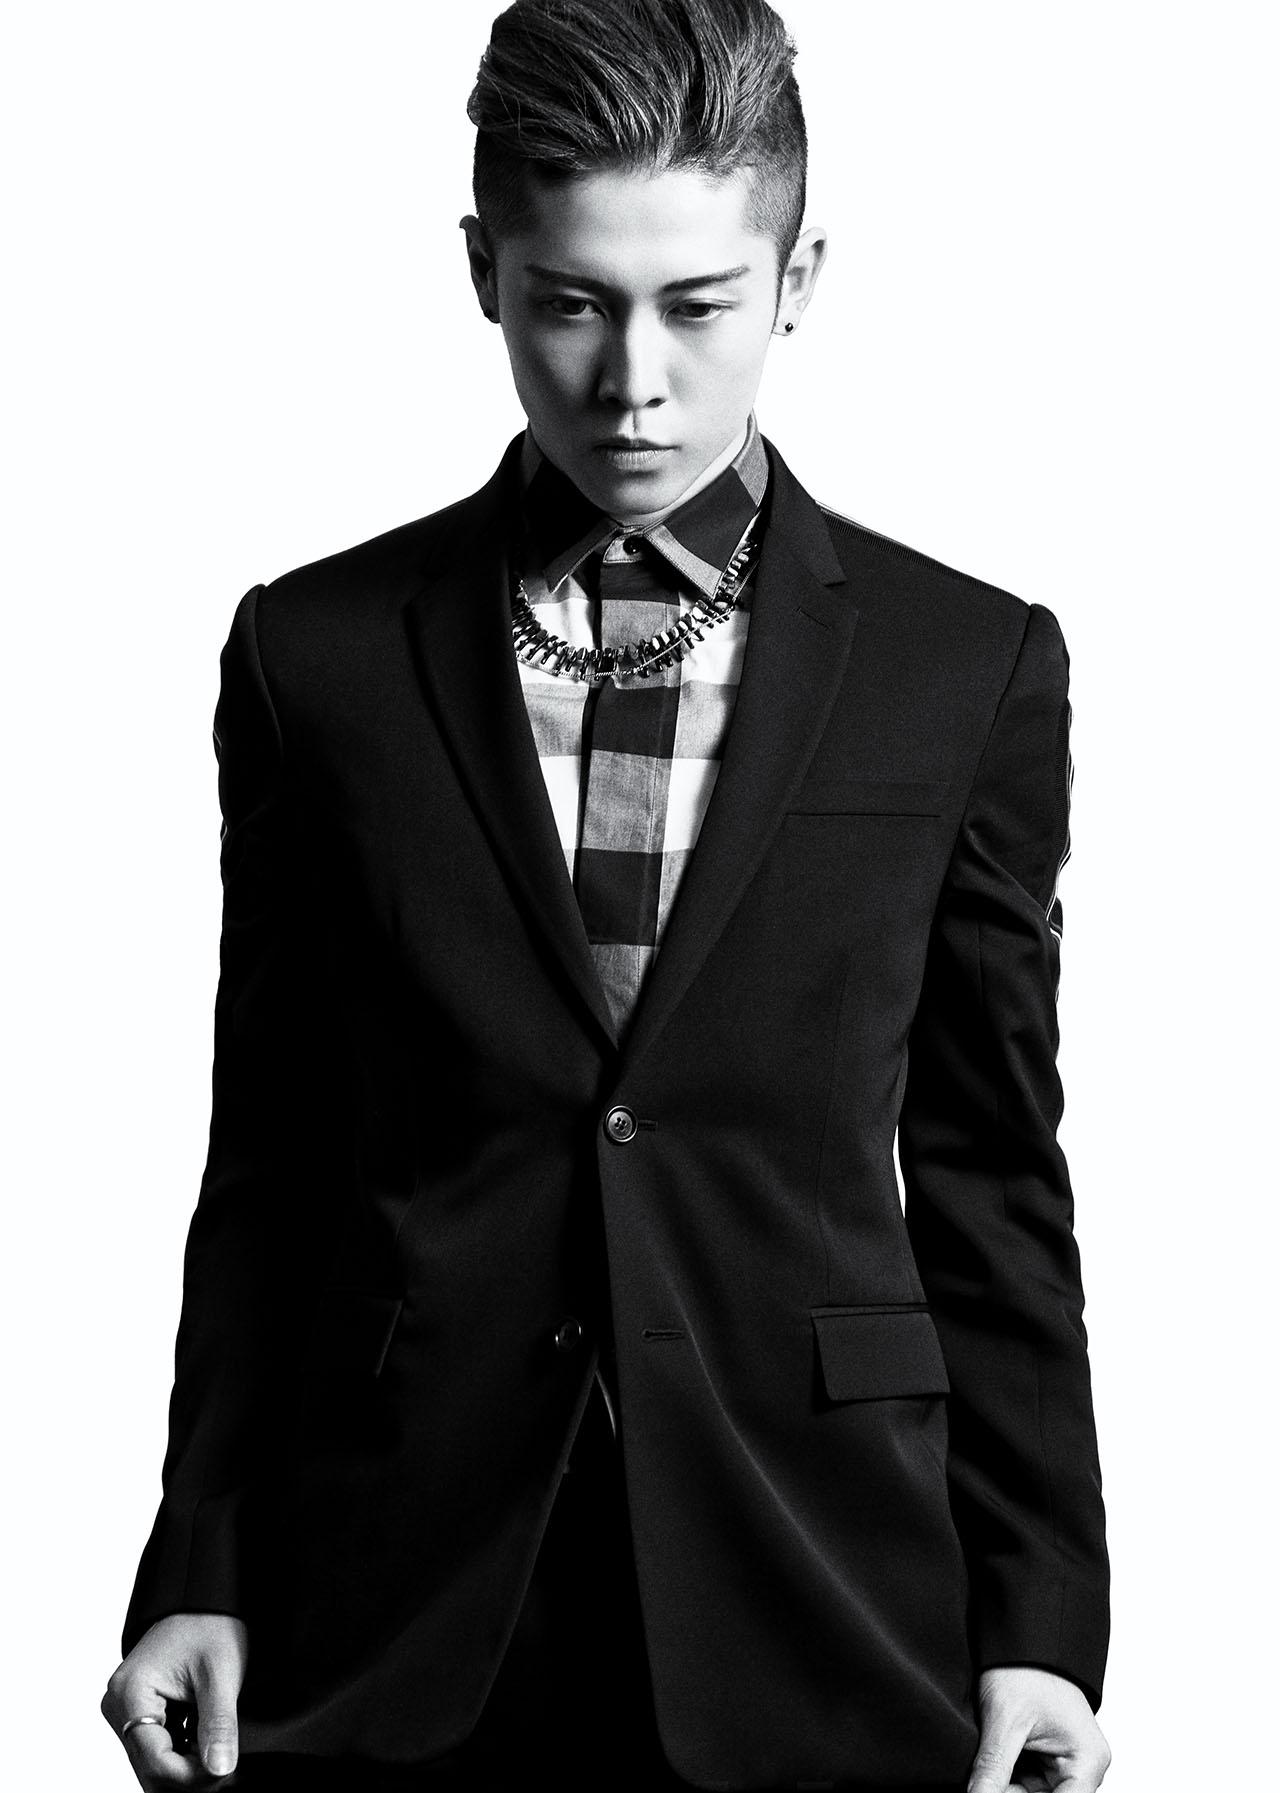 Photographer UTSUMI、Stylist Masaki Kataoka/(着用衣装) ジャケット ¥ 290,000、シャツ ¥ 77,000、トラウザーズ ¥ 145,000、シューズ ¥ 195,000、ネックレス ¥ 59,000 以上全て DIOR HOMME/クリスチャン ディオール 0120-02-1947